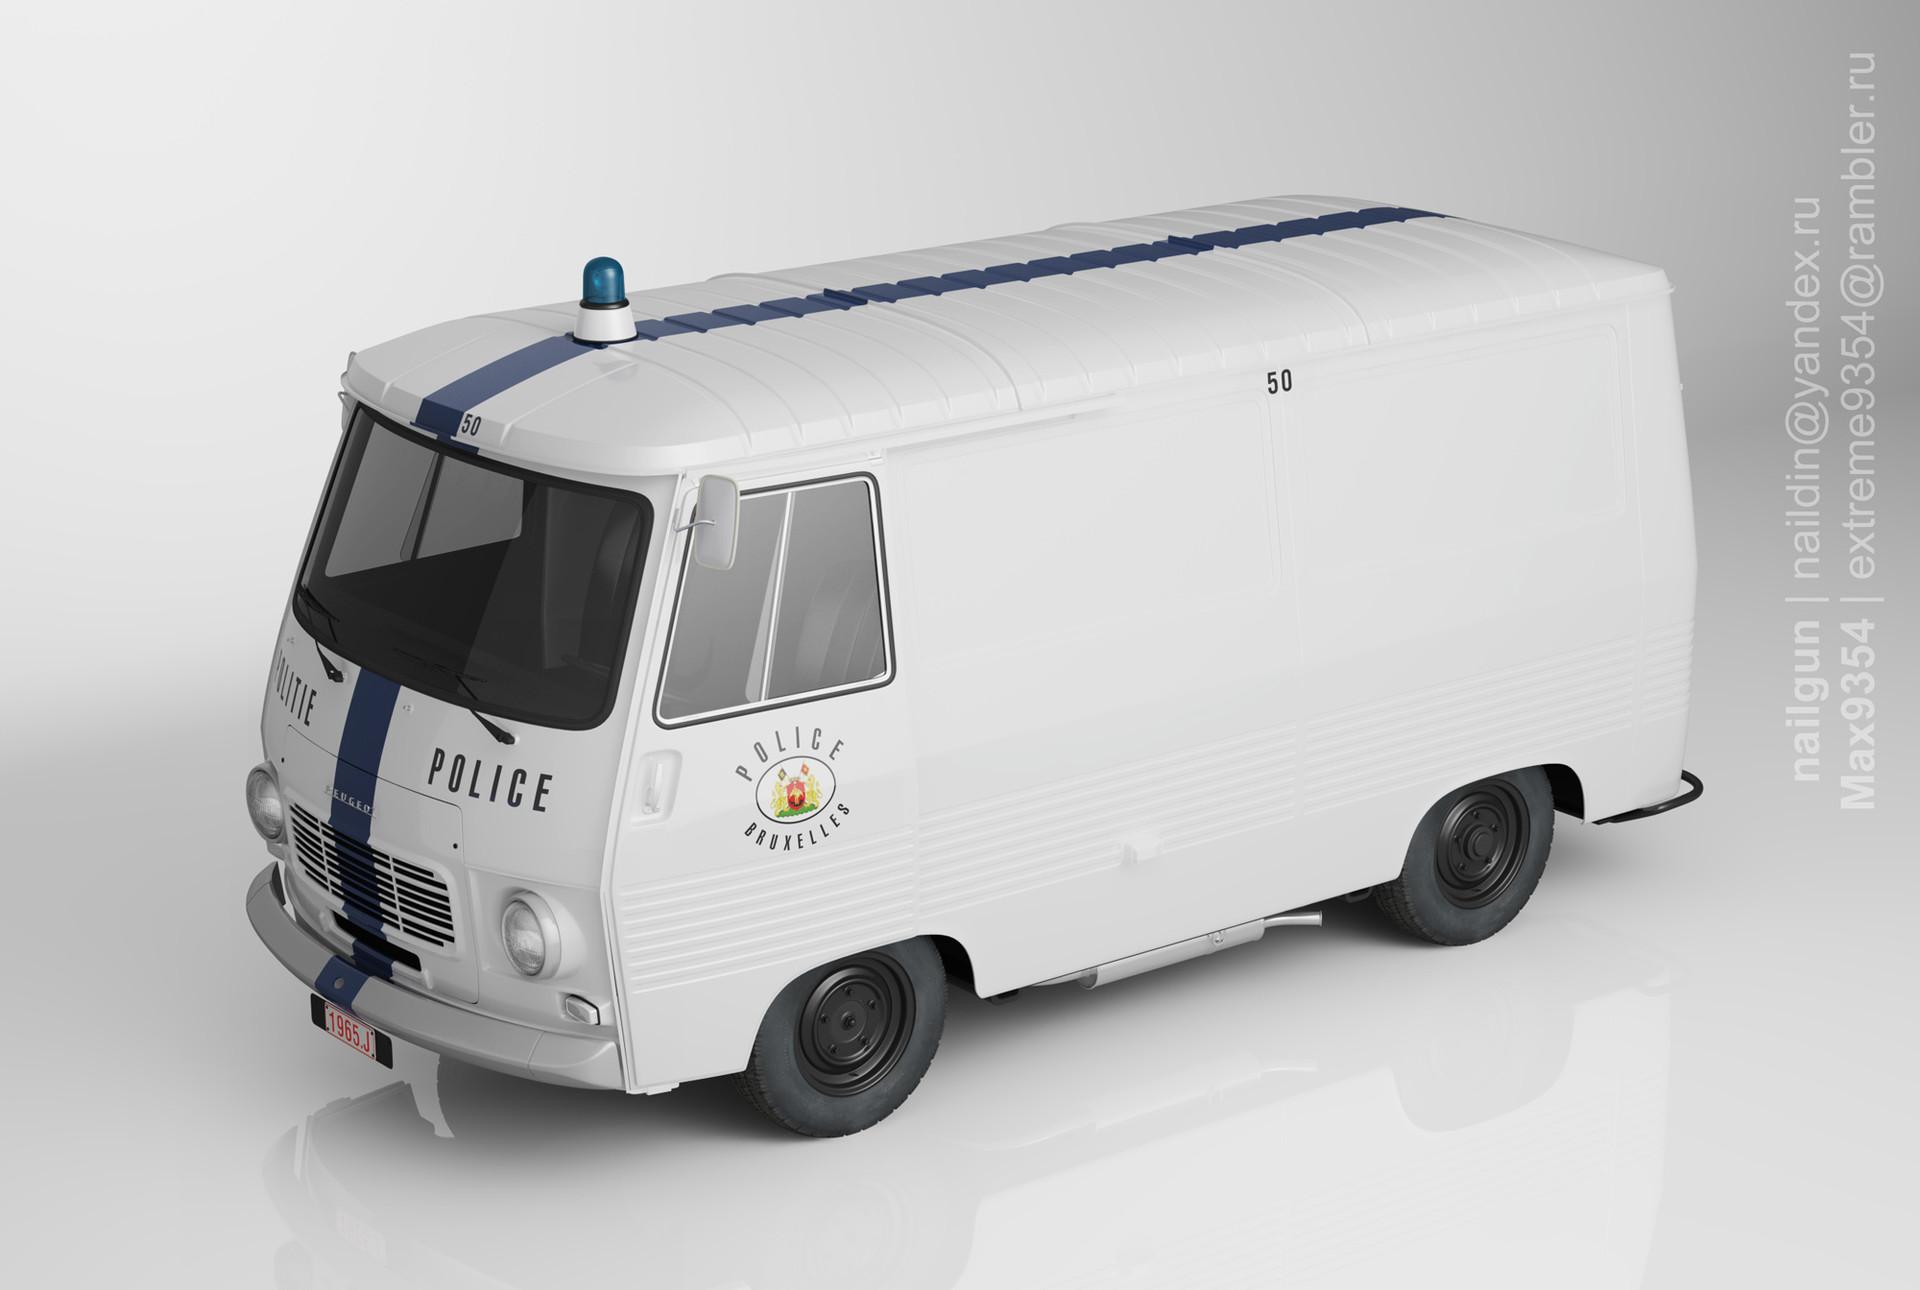 Nail khusnutdinov pwc 066 000 peugeot j7 miniature